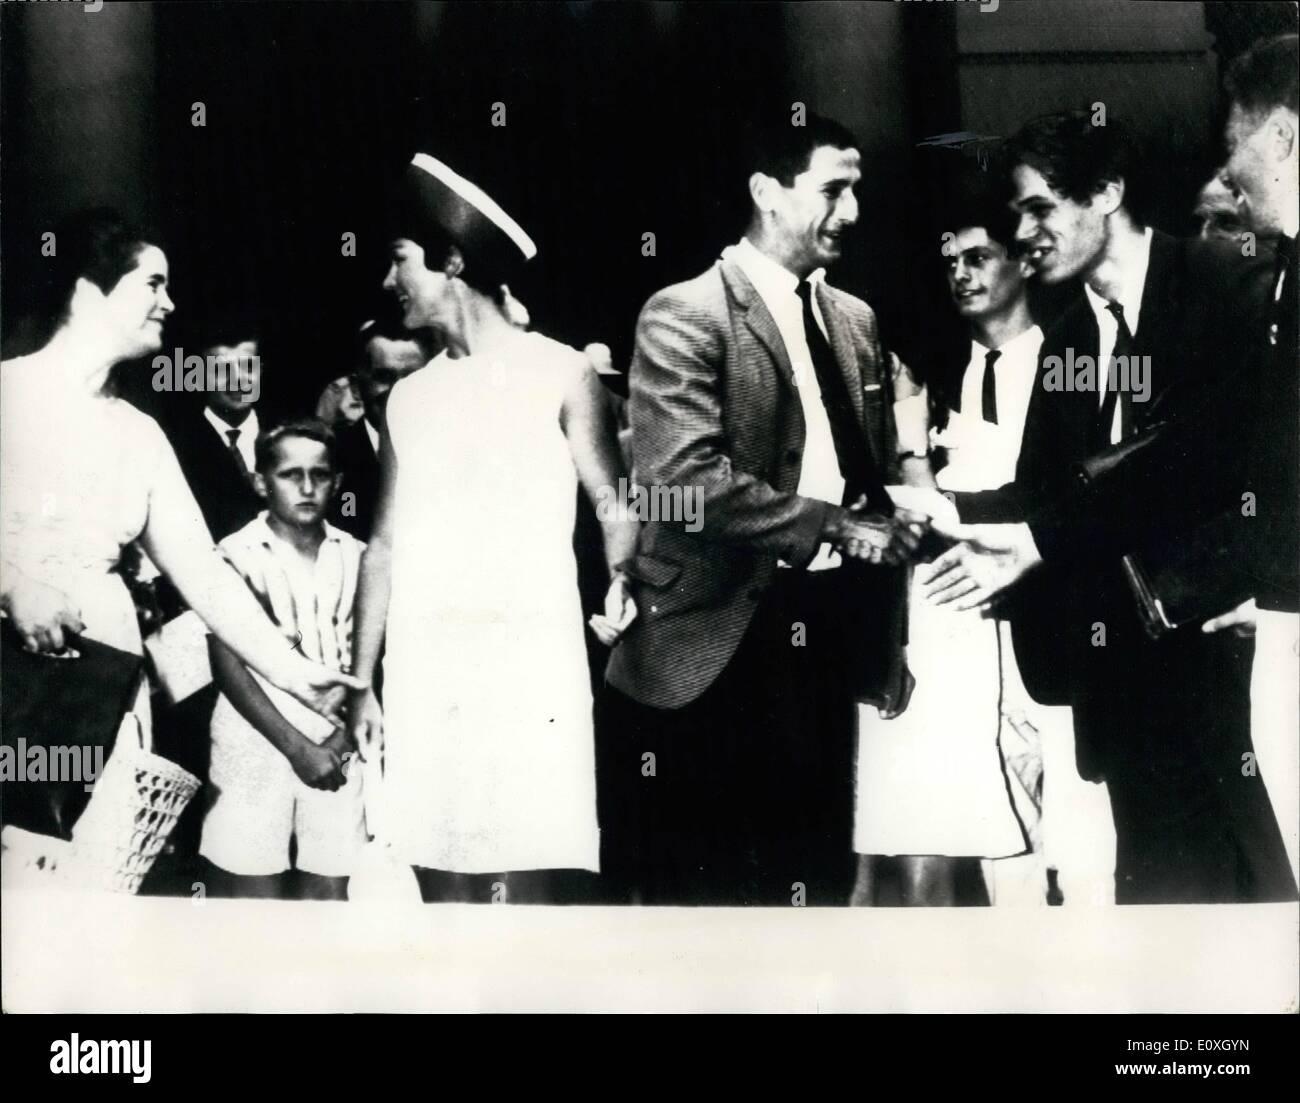 Dec. 12, 1966 - Australian Conscientious Objector Wins Exemption Army Service: Australian conscientious objector, Stock Photo